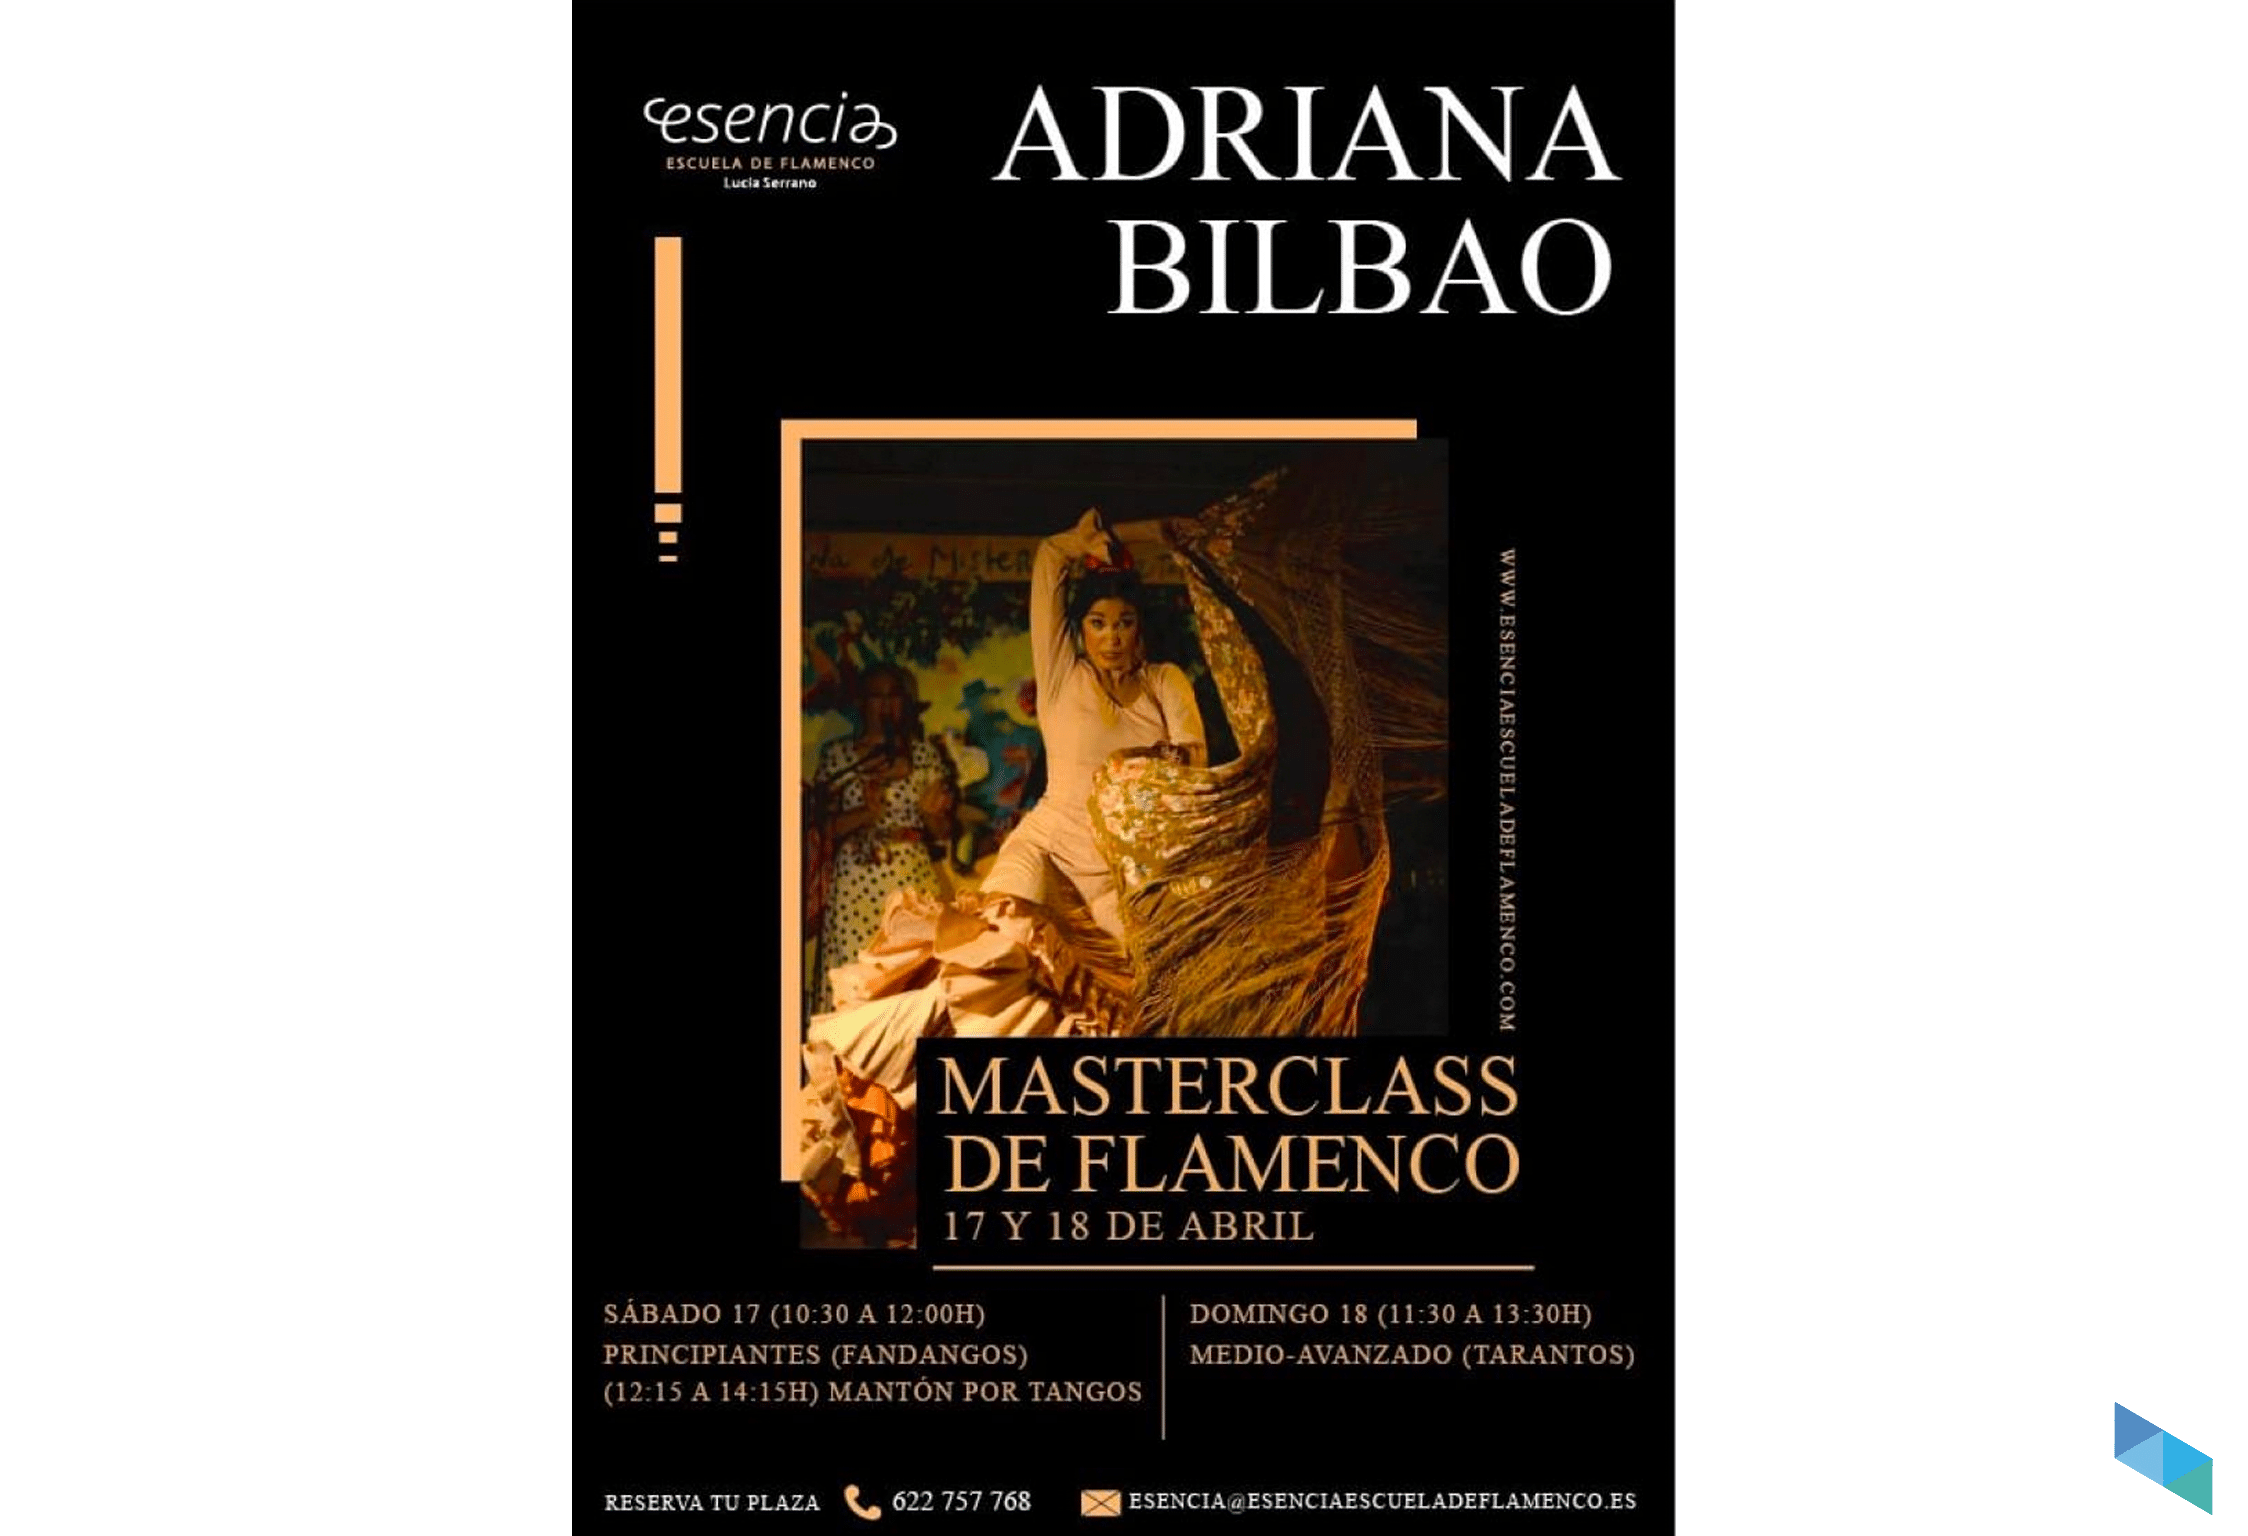 Master Class de flamenco con Adriana Bilbao